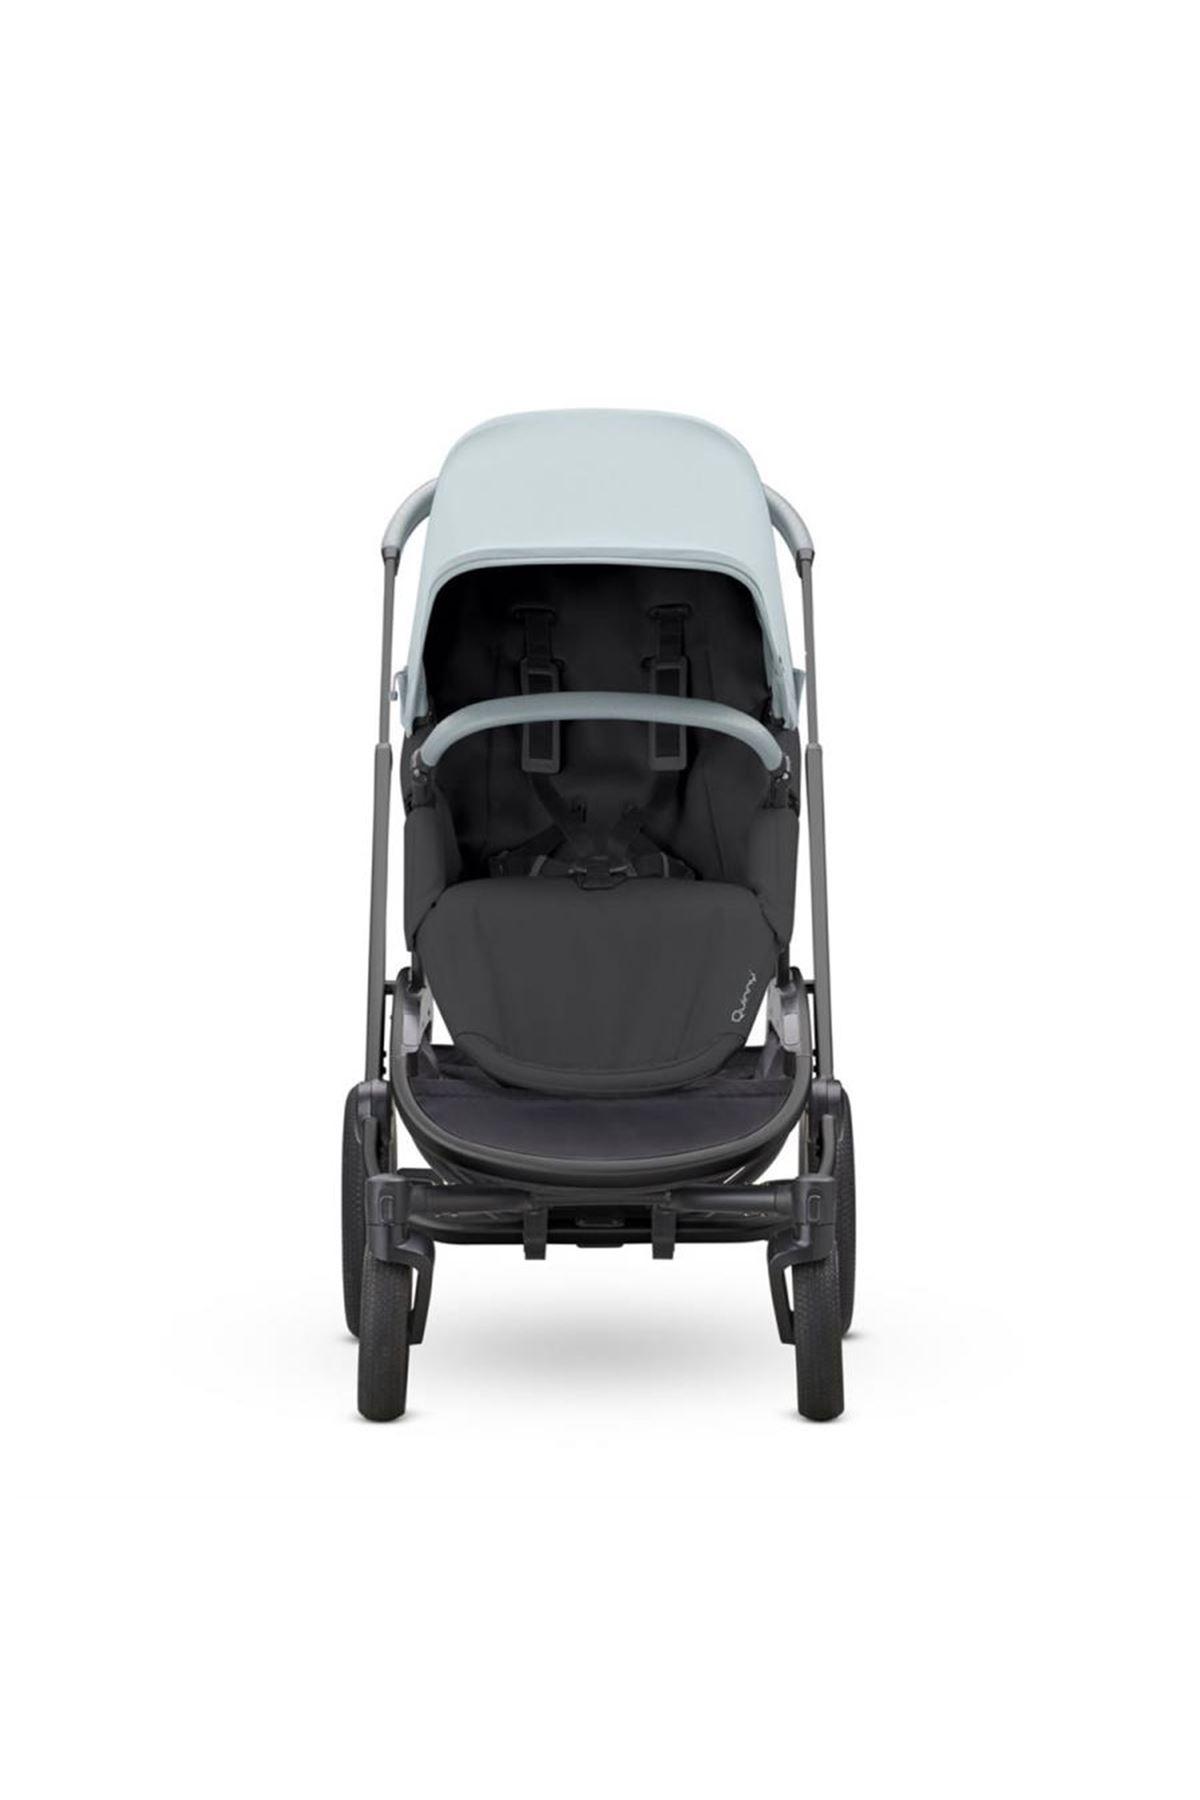 Quinny Hubb Bebek Arabası / Frost on Black